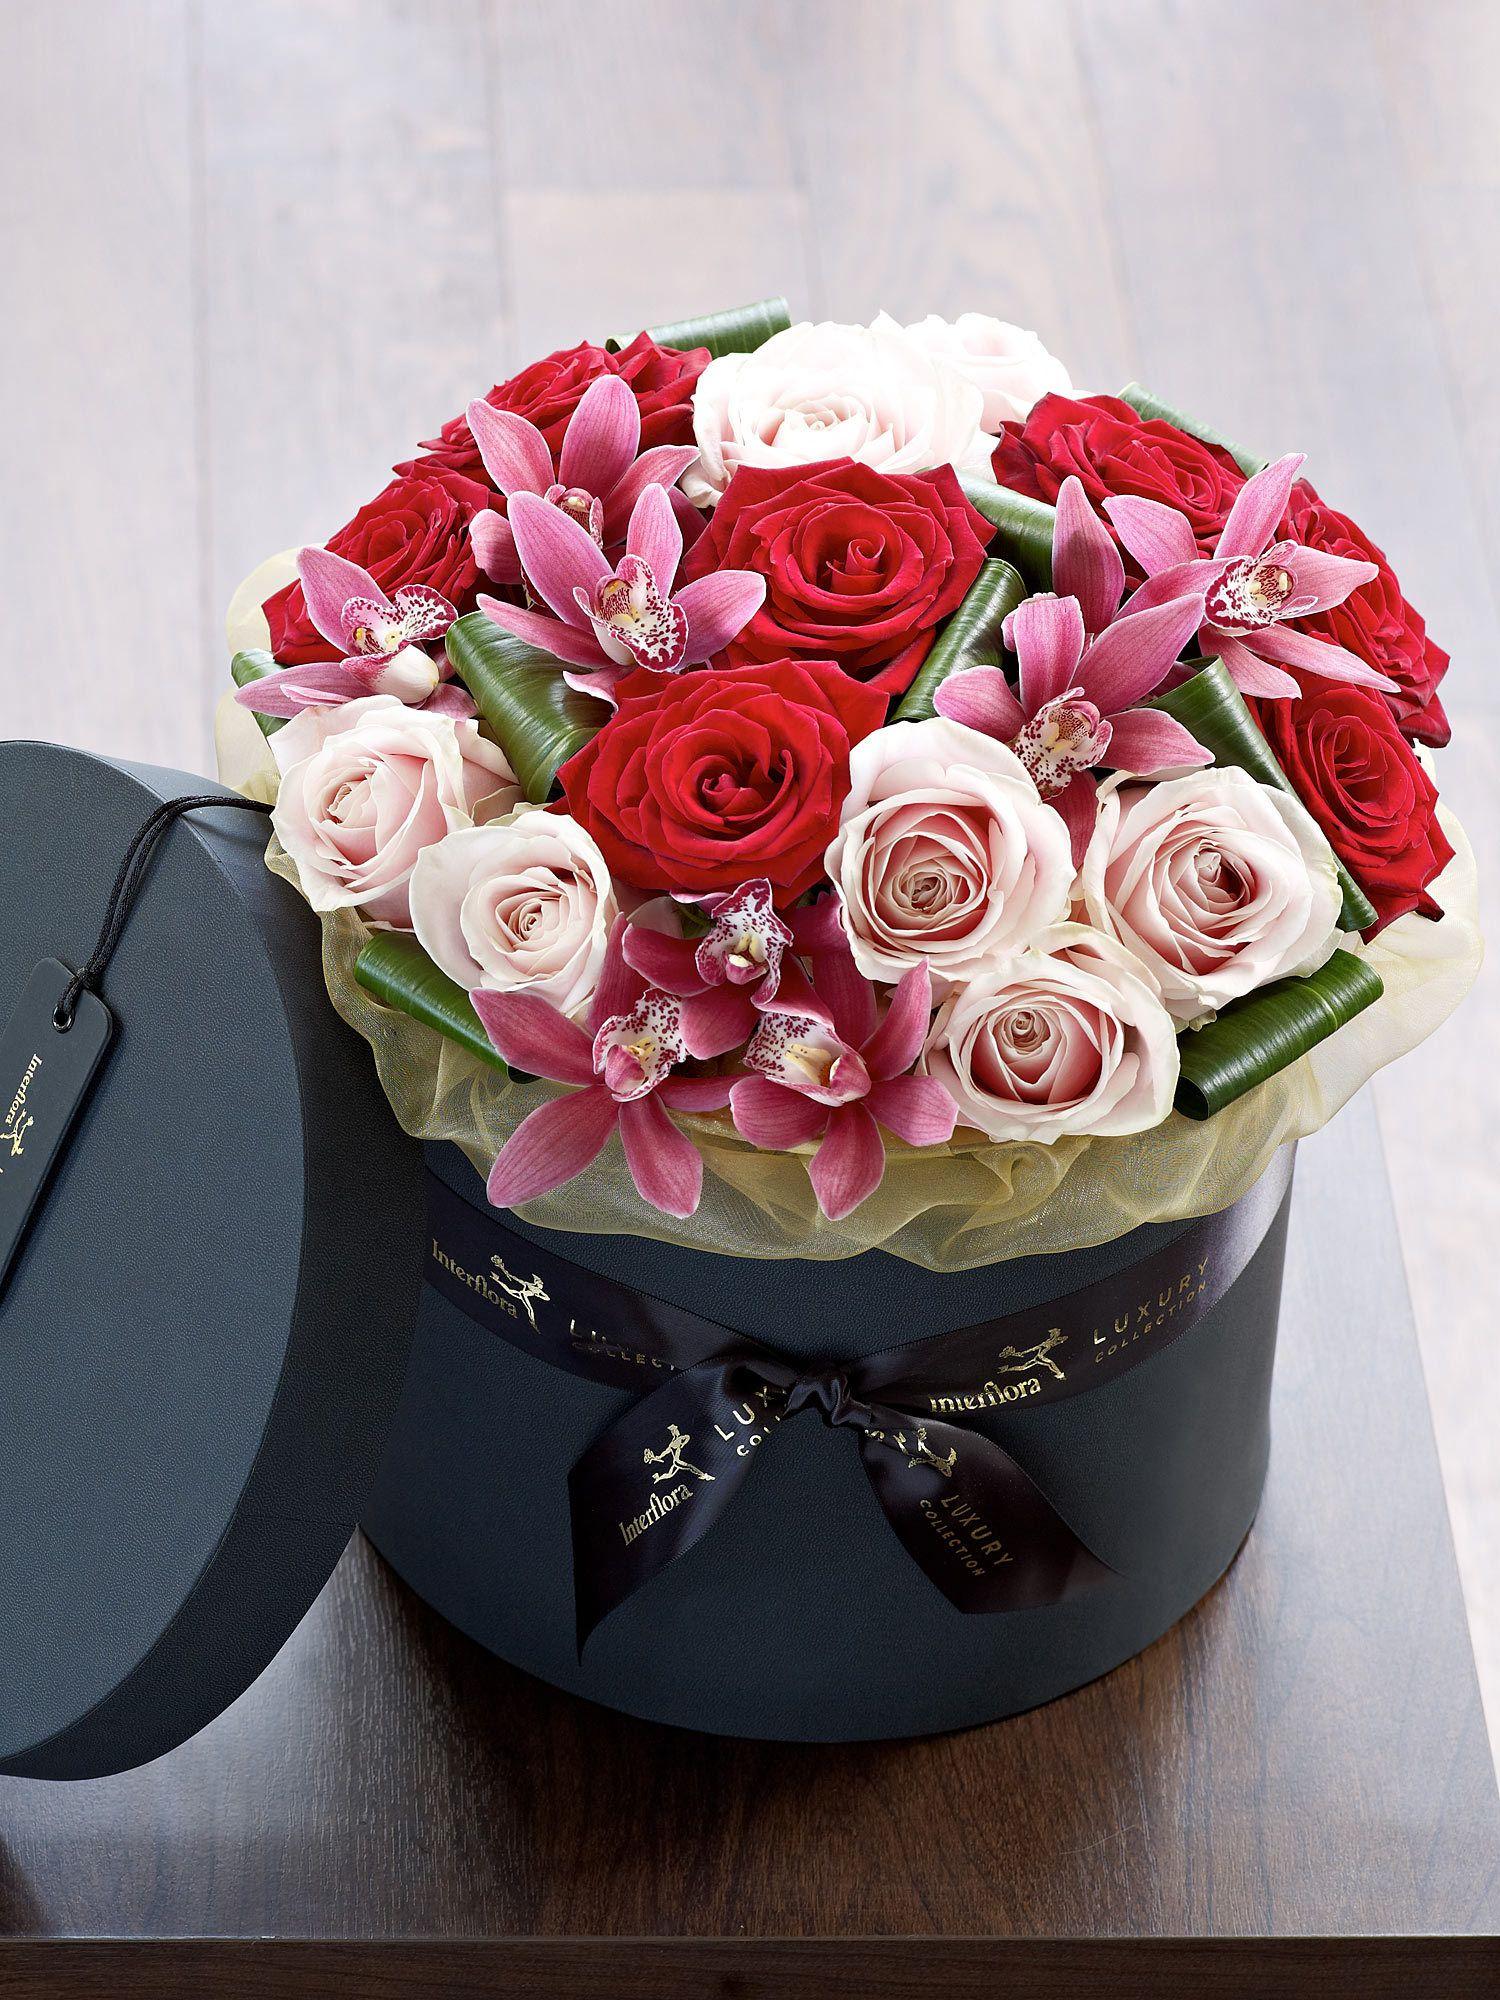 Luxury Rose and Cymbidium Orchid Hatbox Anniversary